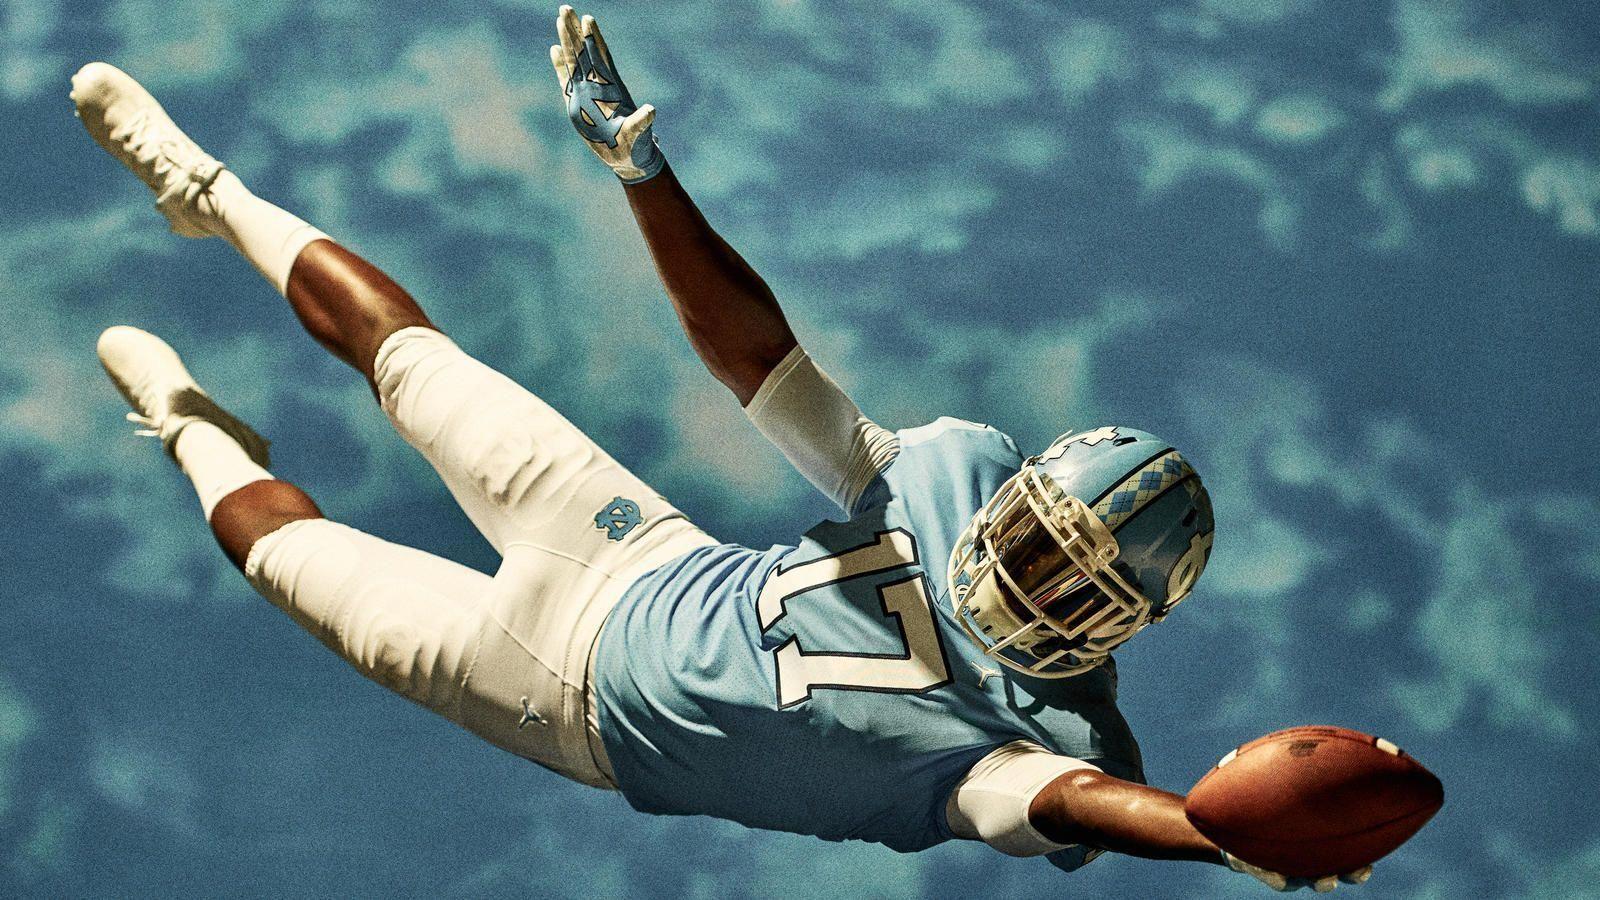 b871629e39b0 Nike News - Jordan Brand Reveals the University of North Carolina Football  Uniforms  basketballrules